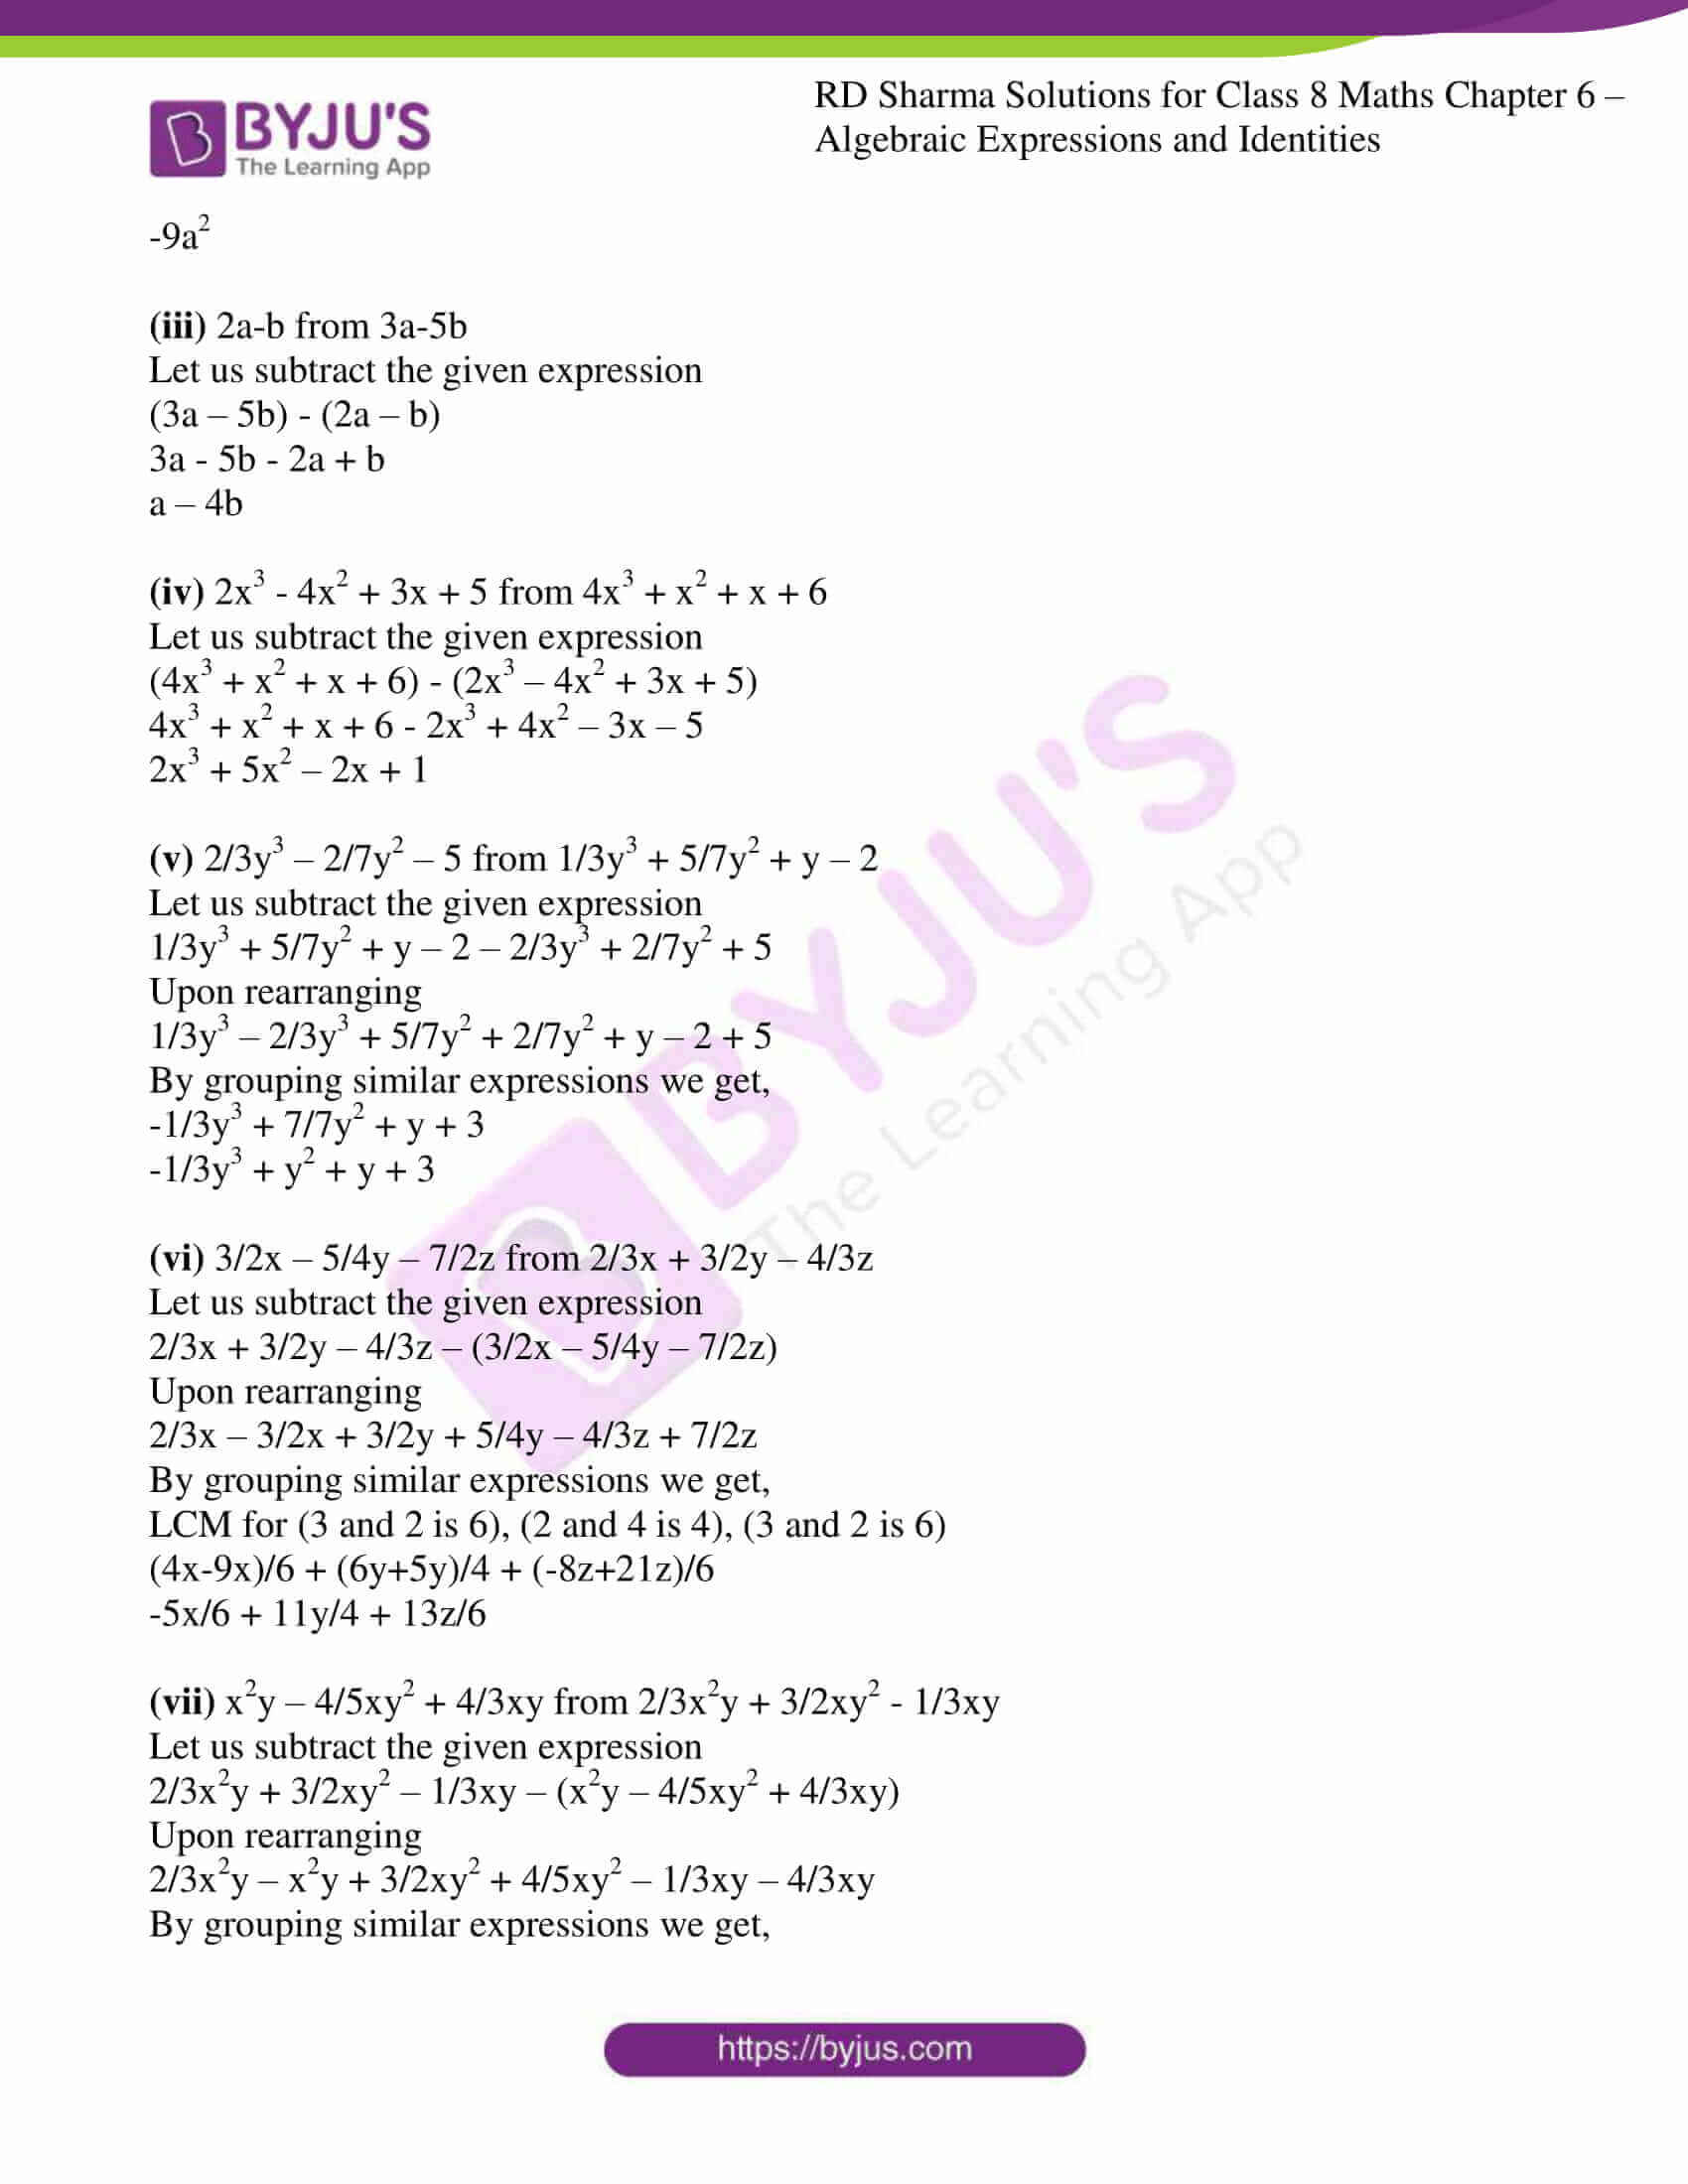 rd sharma class 8 maths chapter 6 exercise 2 3